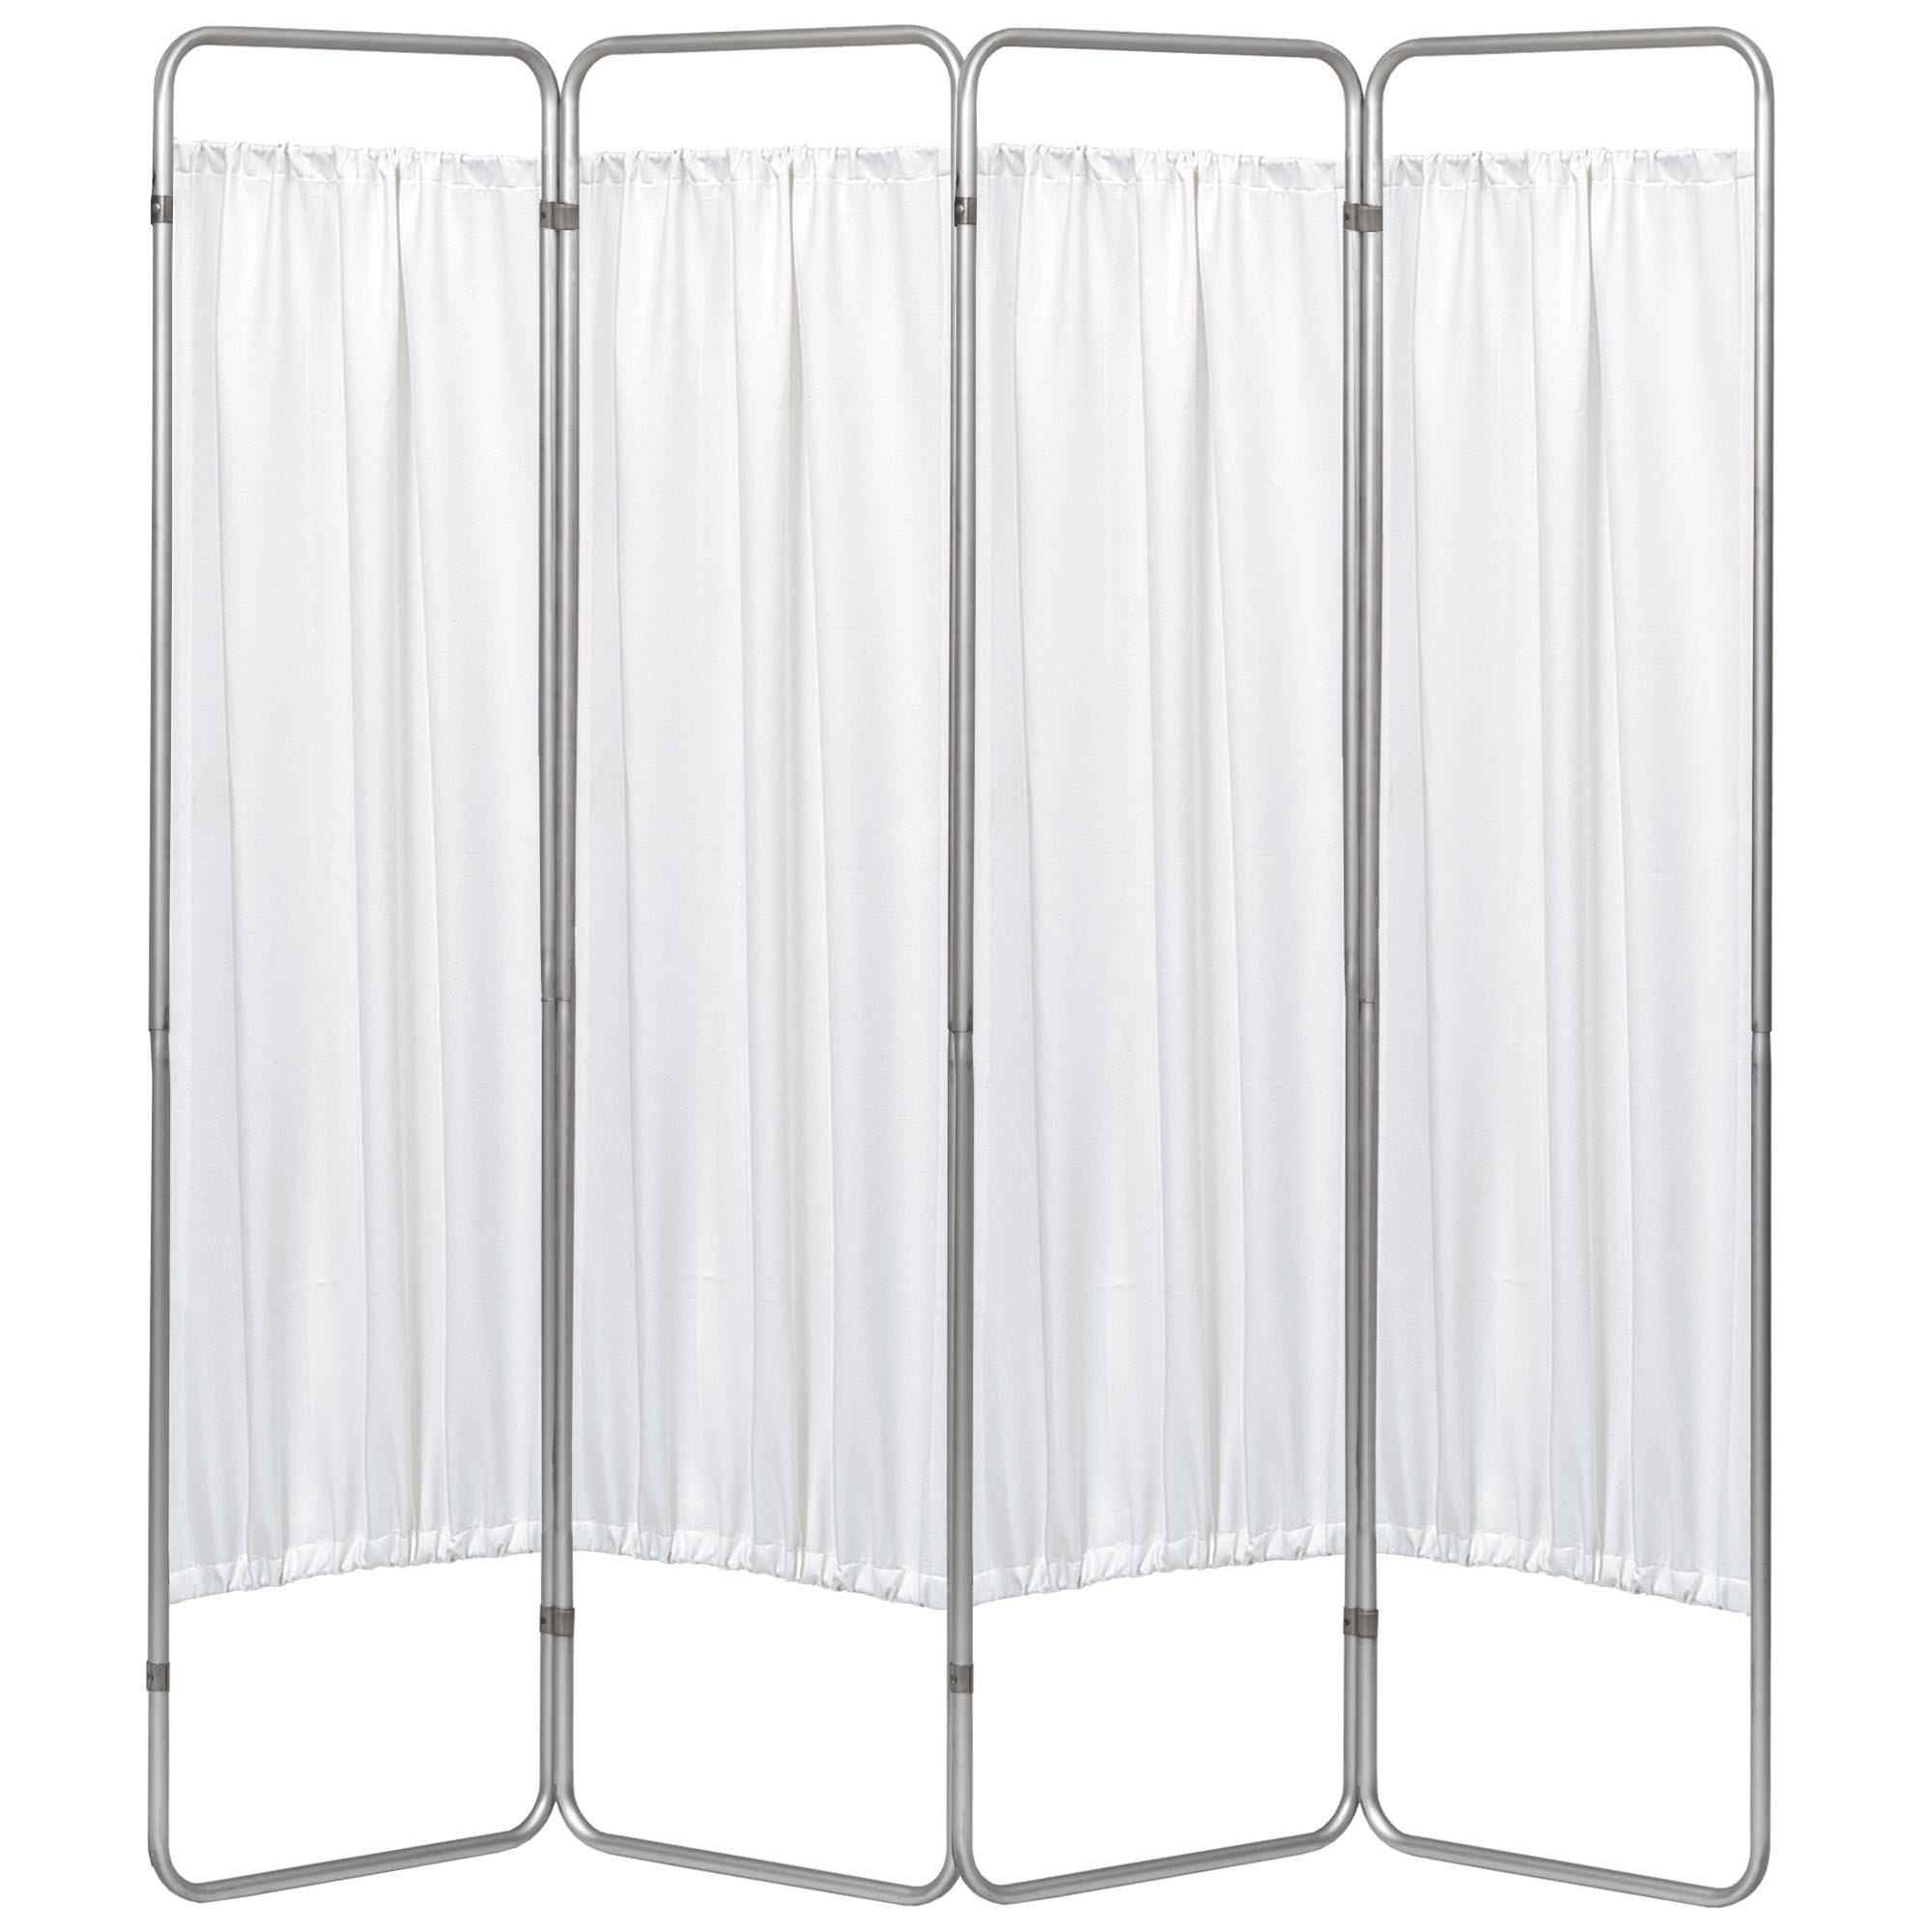 Economy 4 Section Folding Privacy Screen - White Vinyl Screen Panel